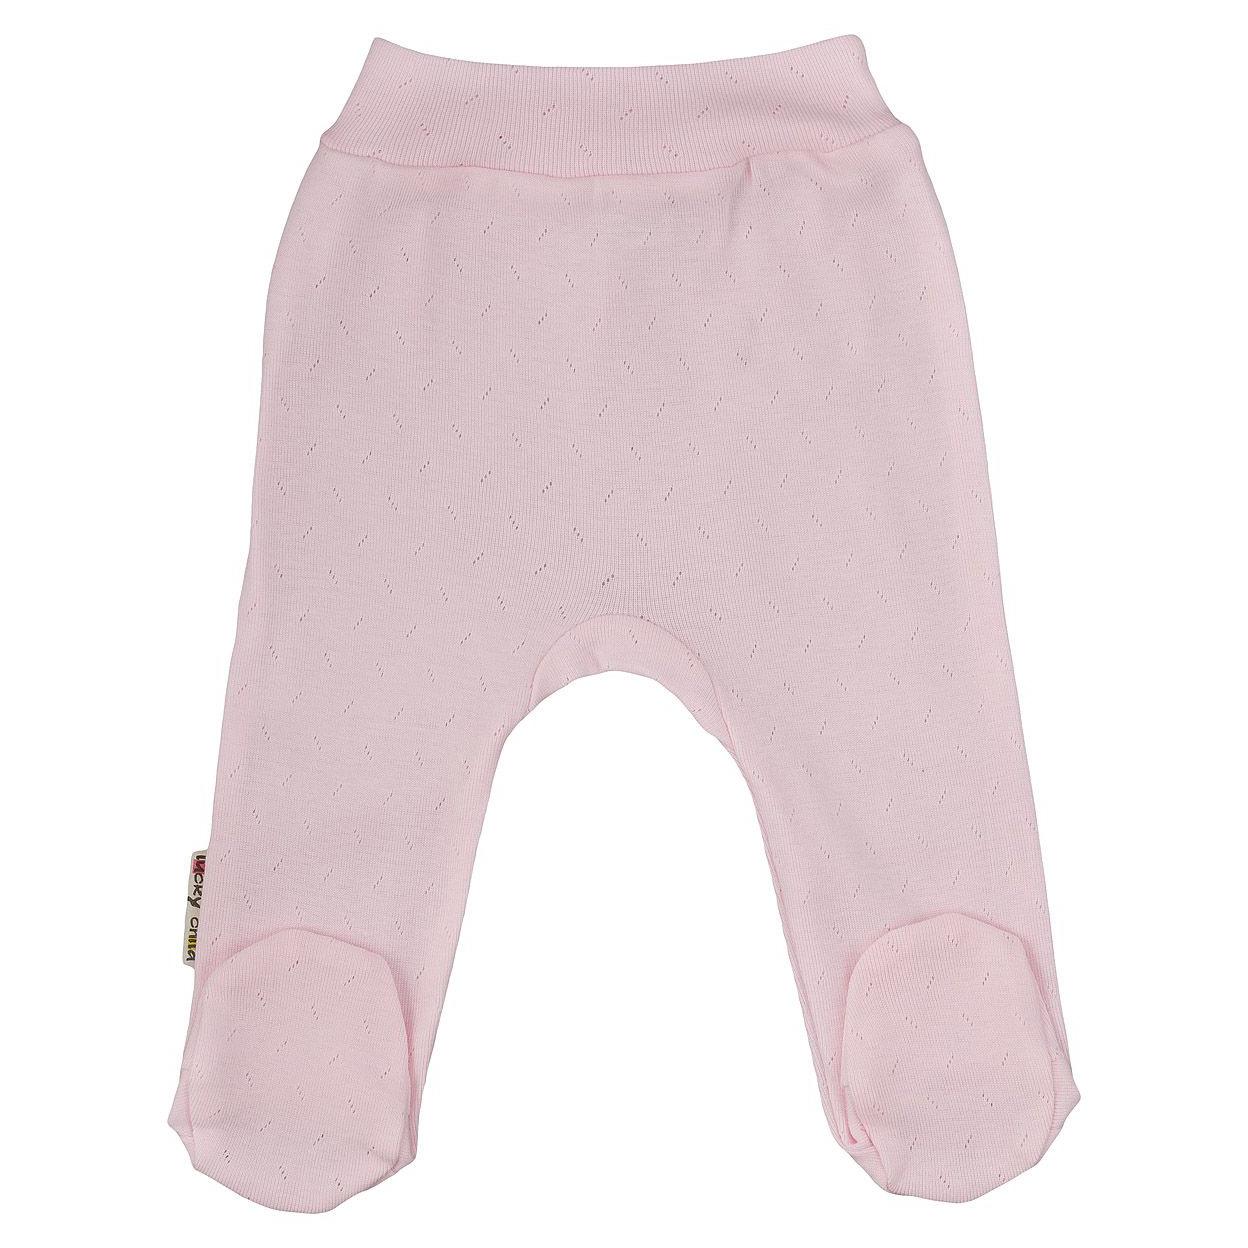 Фото - Ползунки Lucky Child Ажур розовые 74-80 футболка lucky child ажур белая 74 80